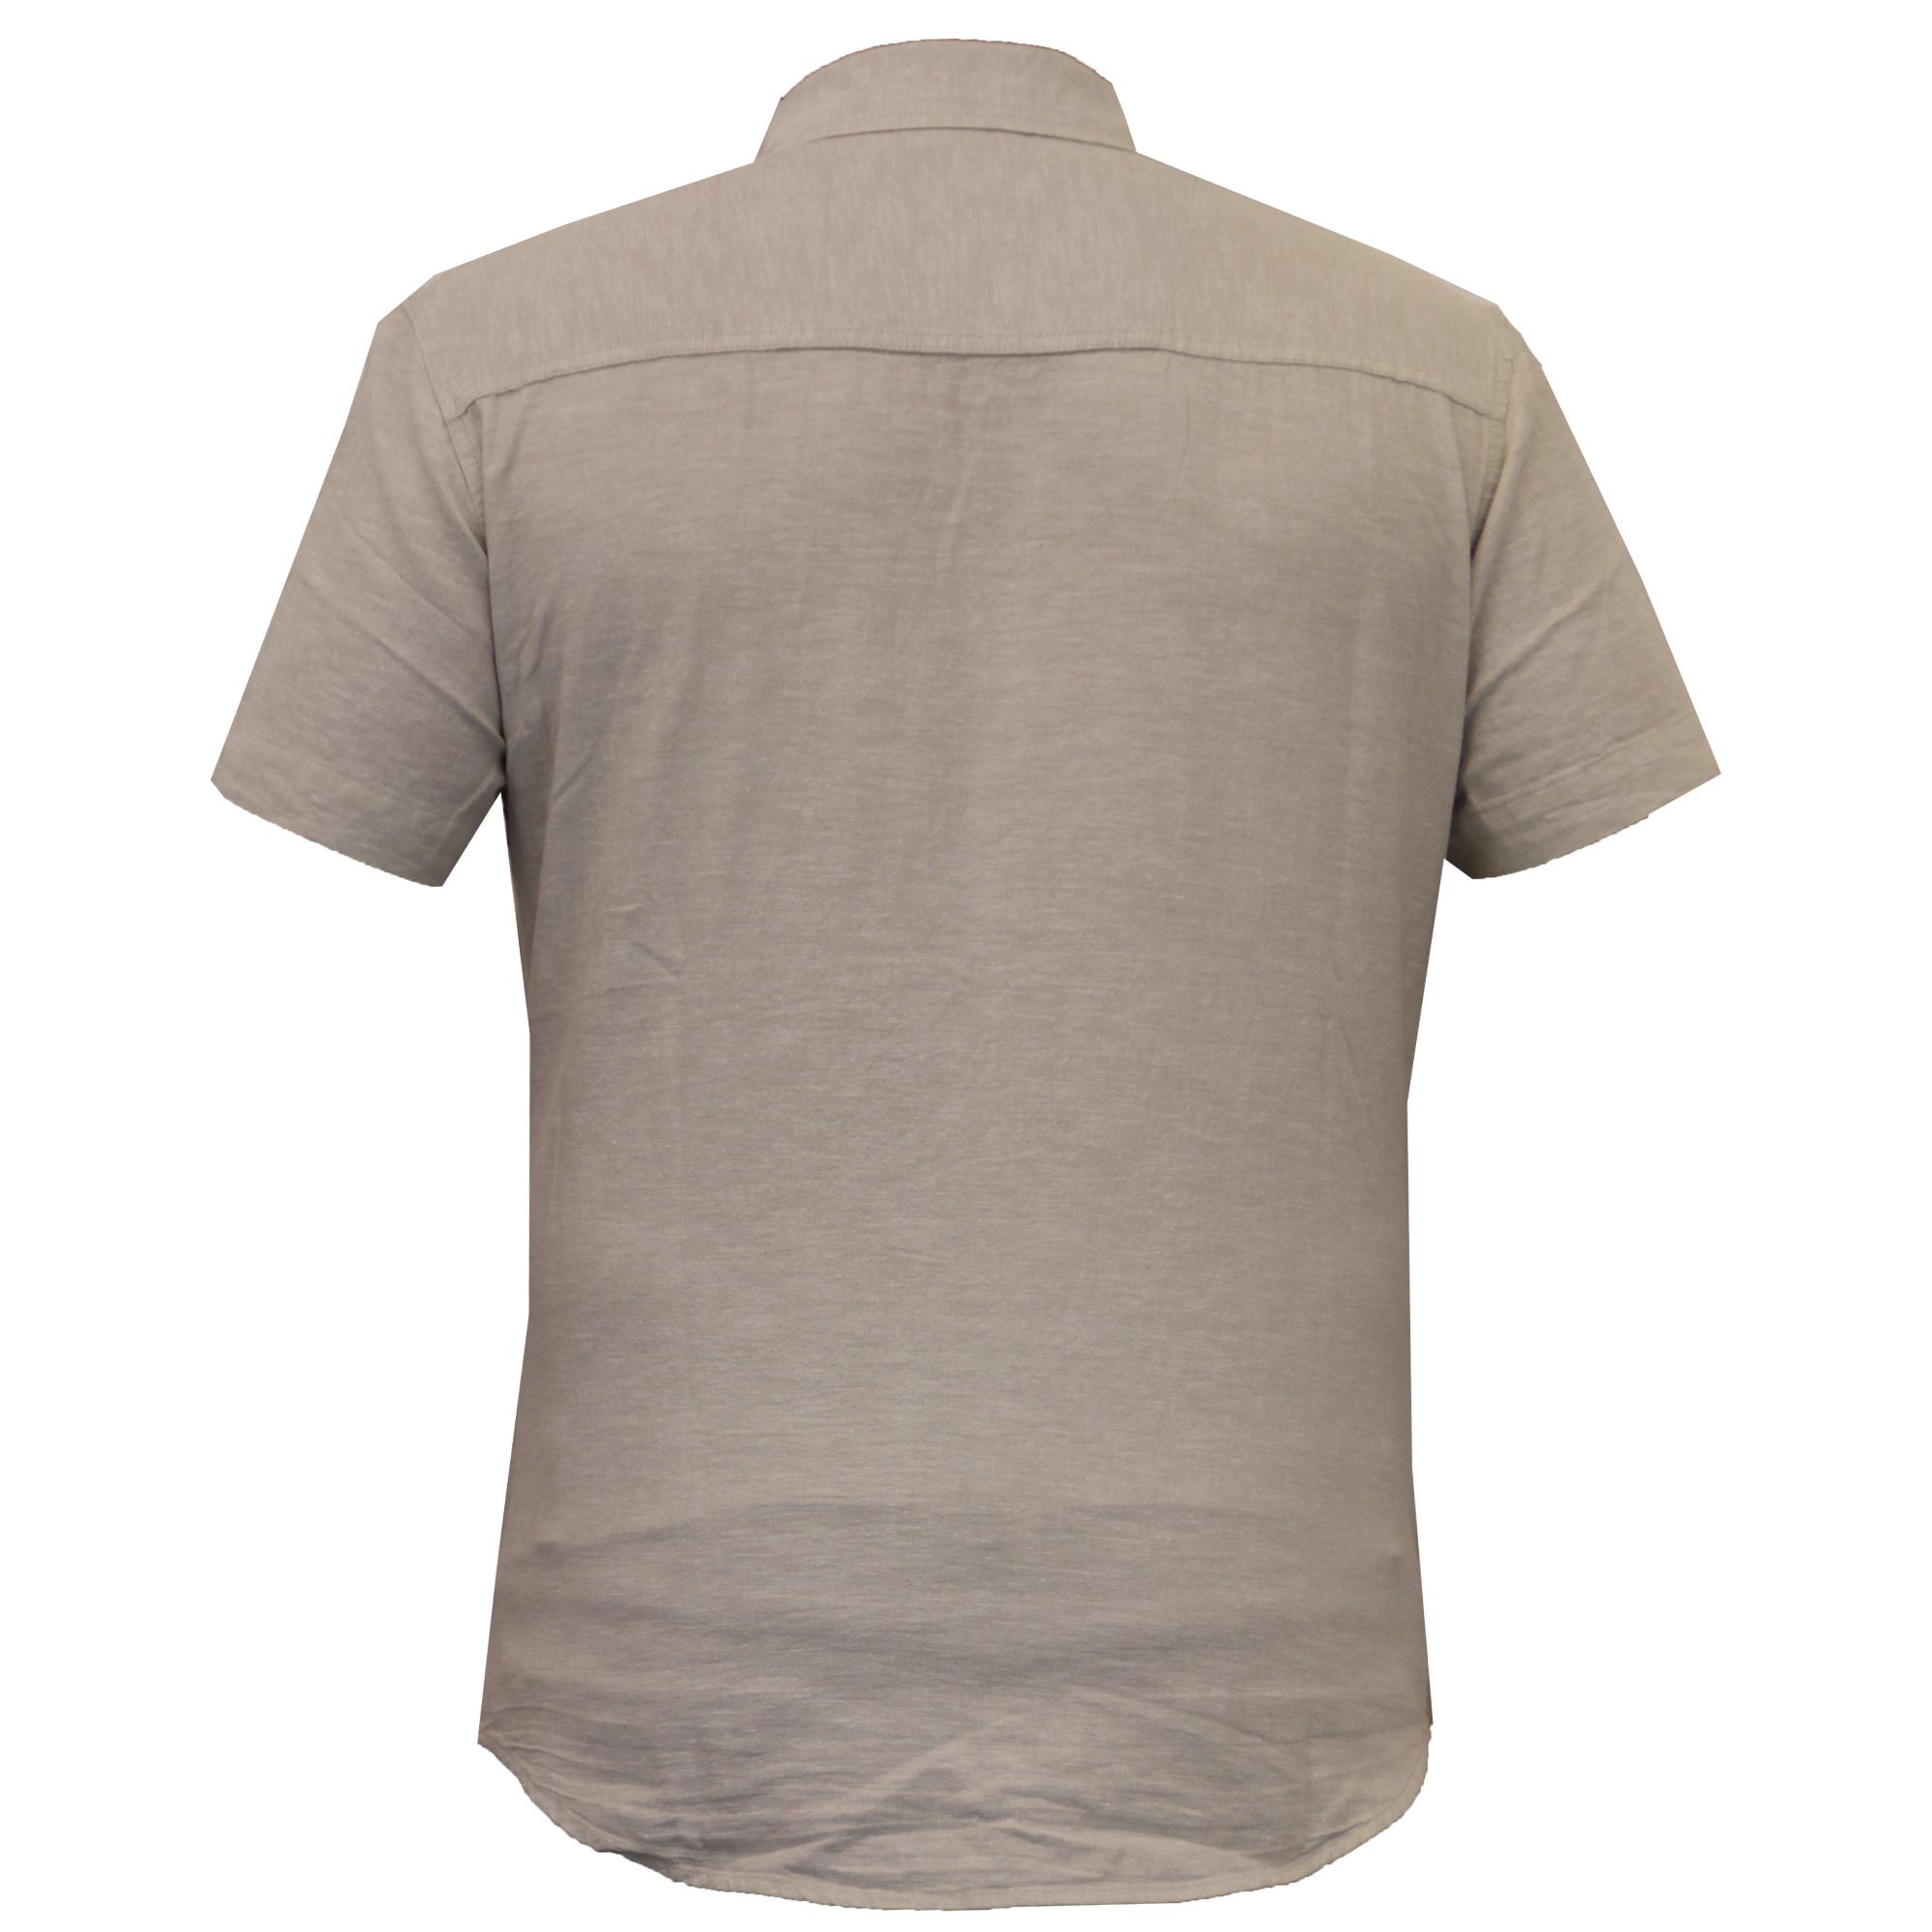 Mens-Linen-Shirt-Threadbare-Short-Sleeved-Brave-Soul-Collared-Casual-Summer-New thumbnail 23